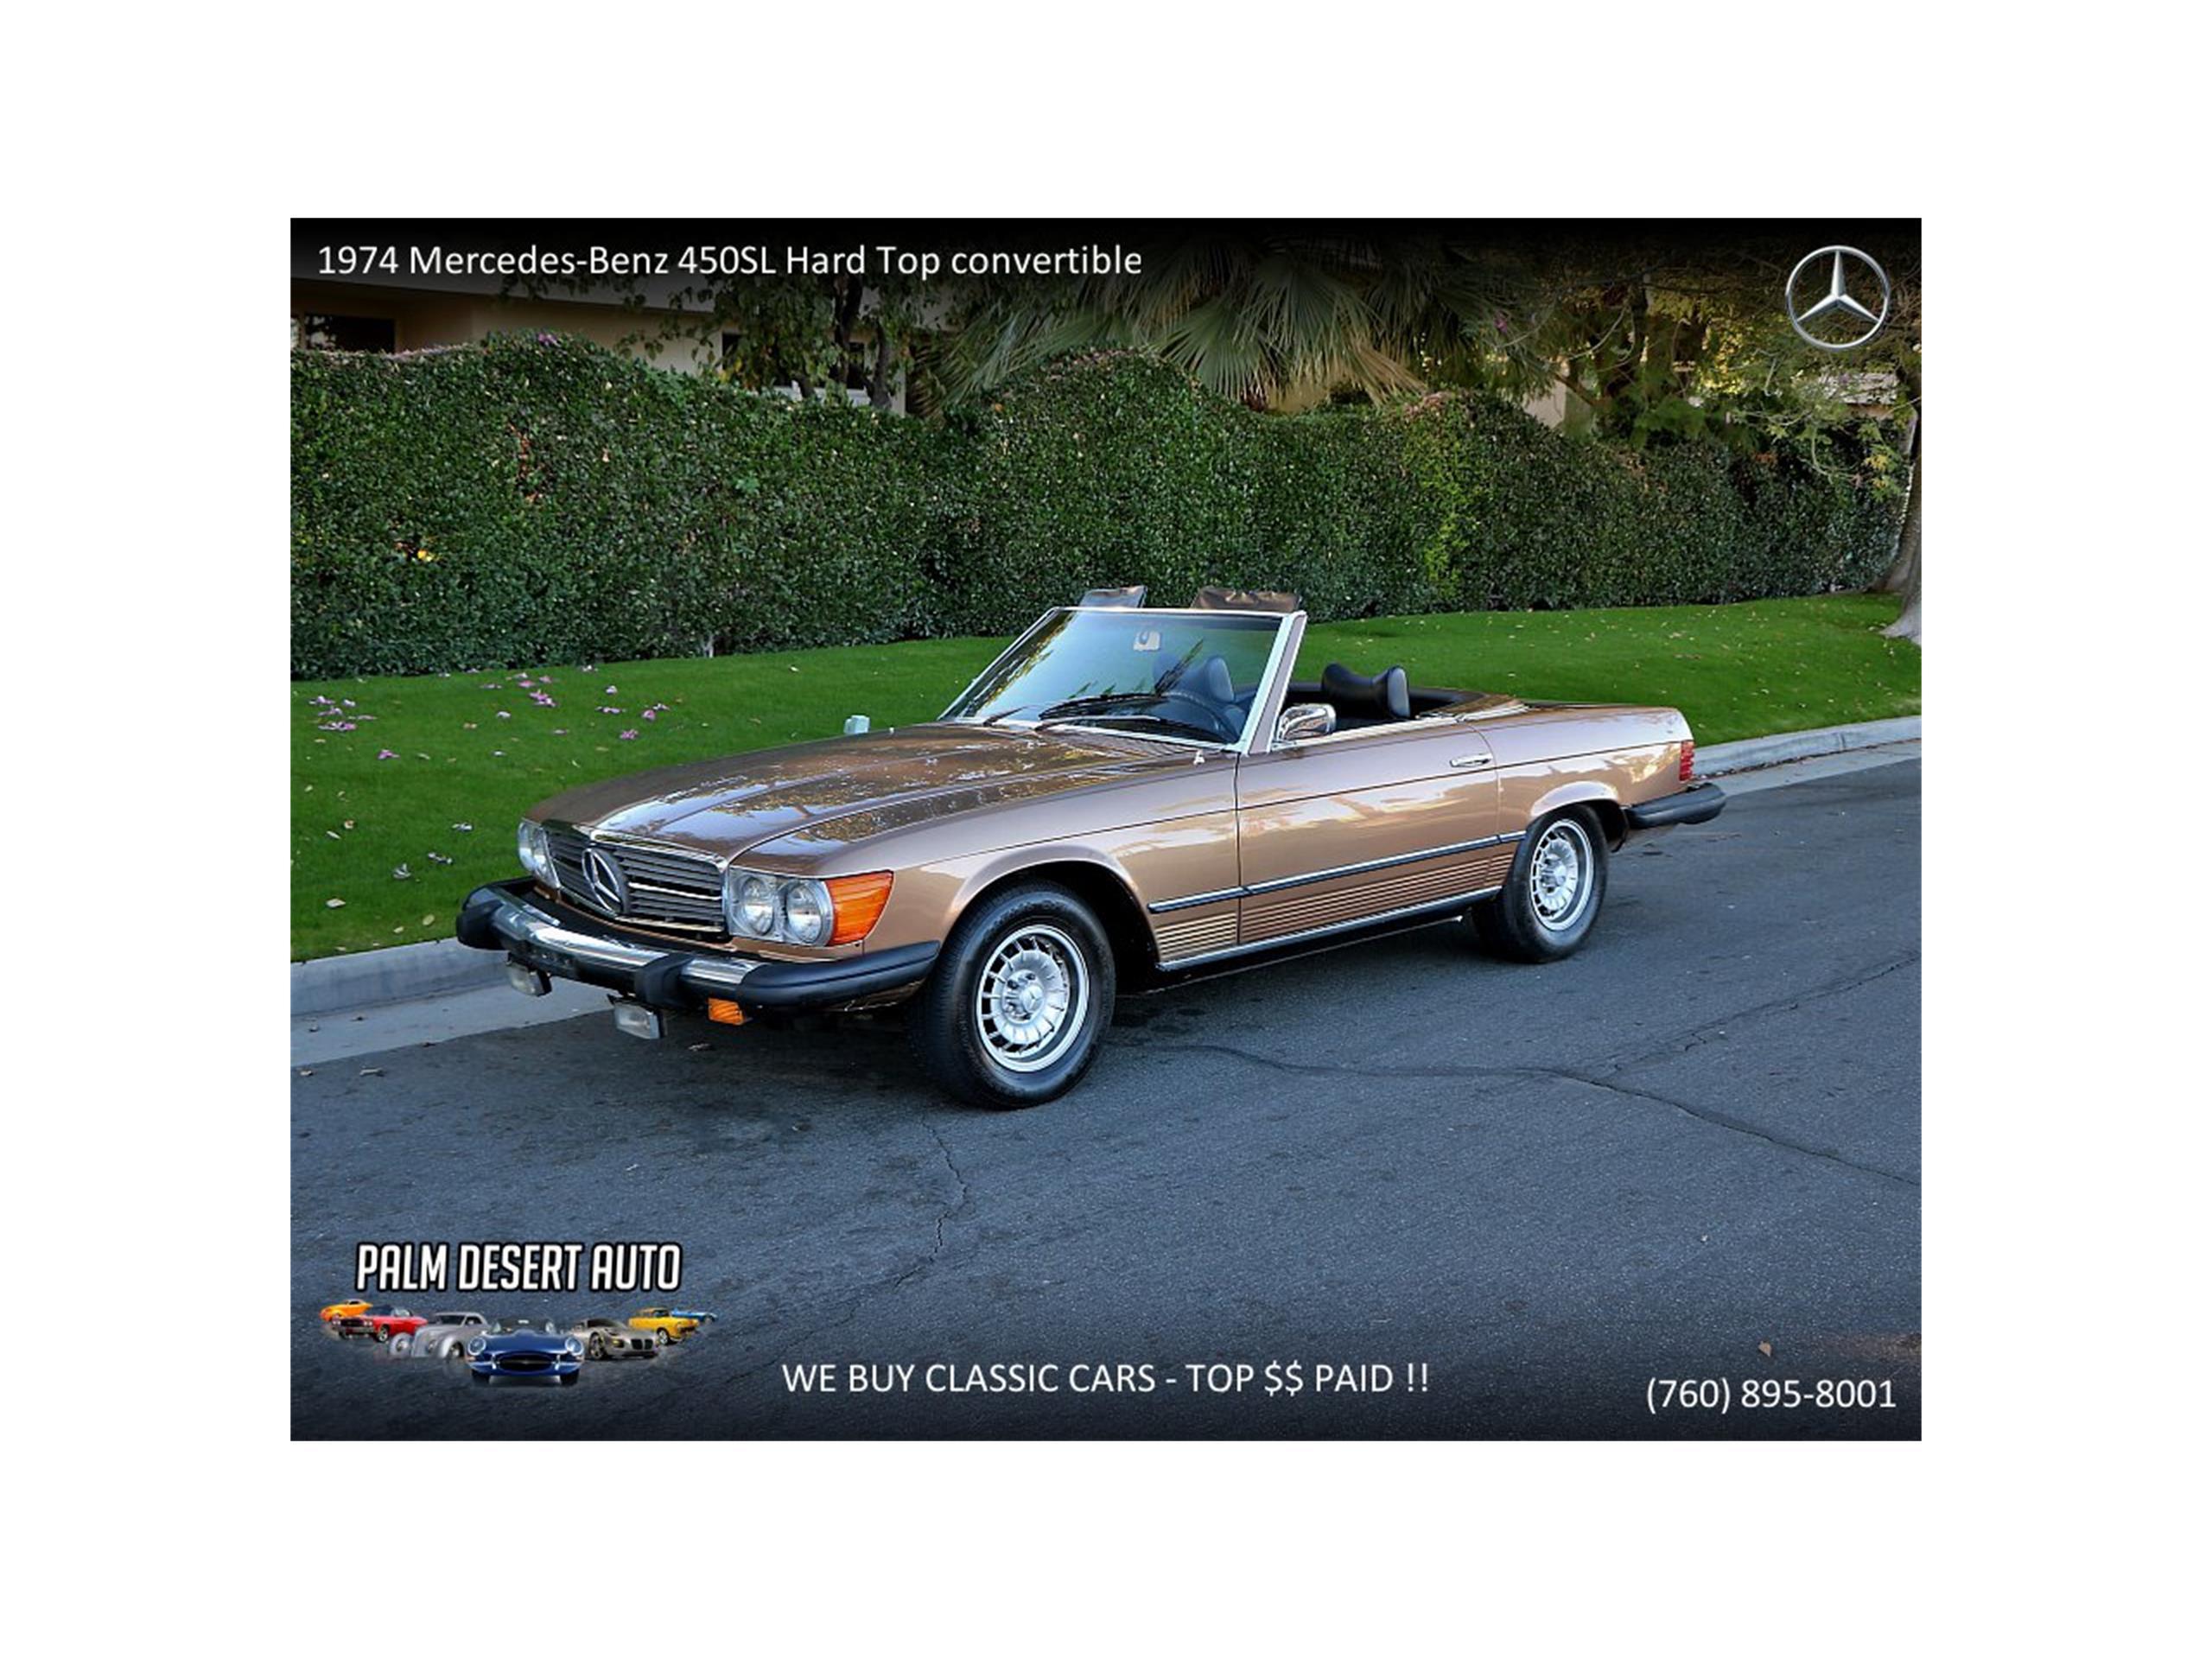 1974 mercedes benz 450sl for sale classiccars com cc 1111305 rh classiccars com 1974 450SL Performance 1970 450SL